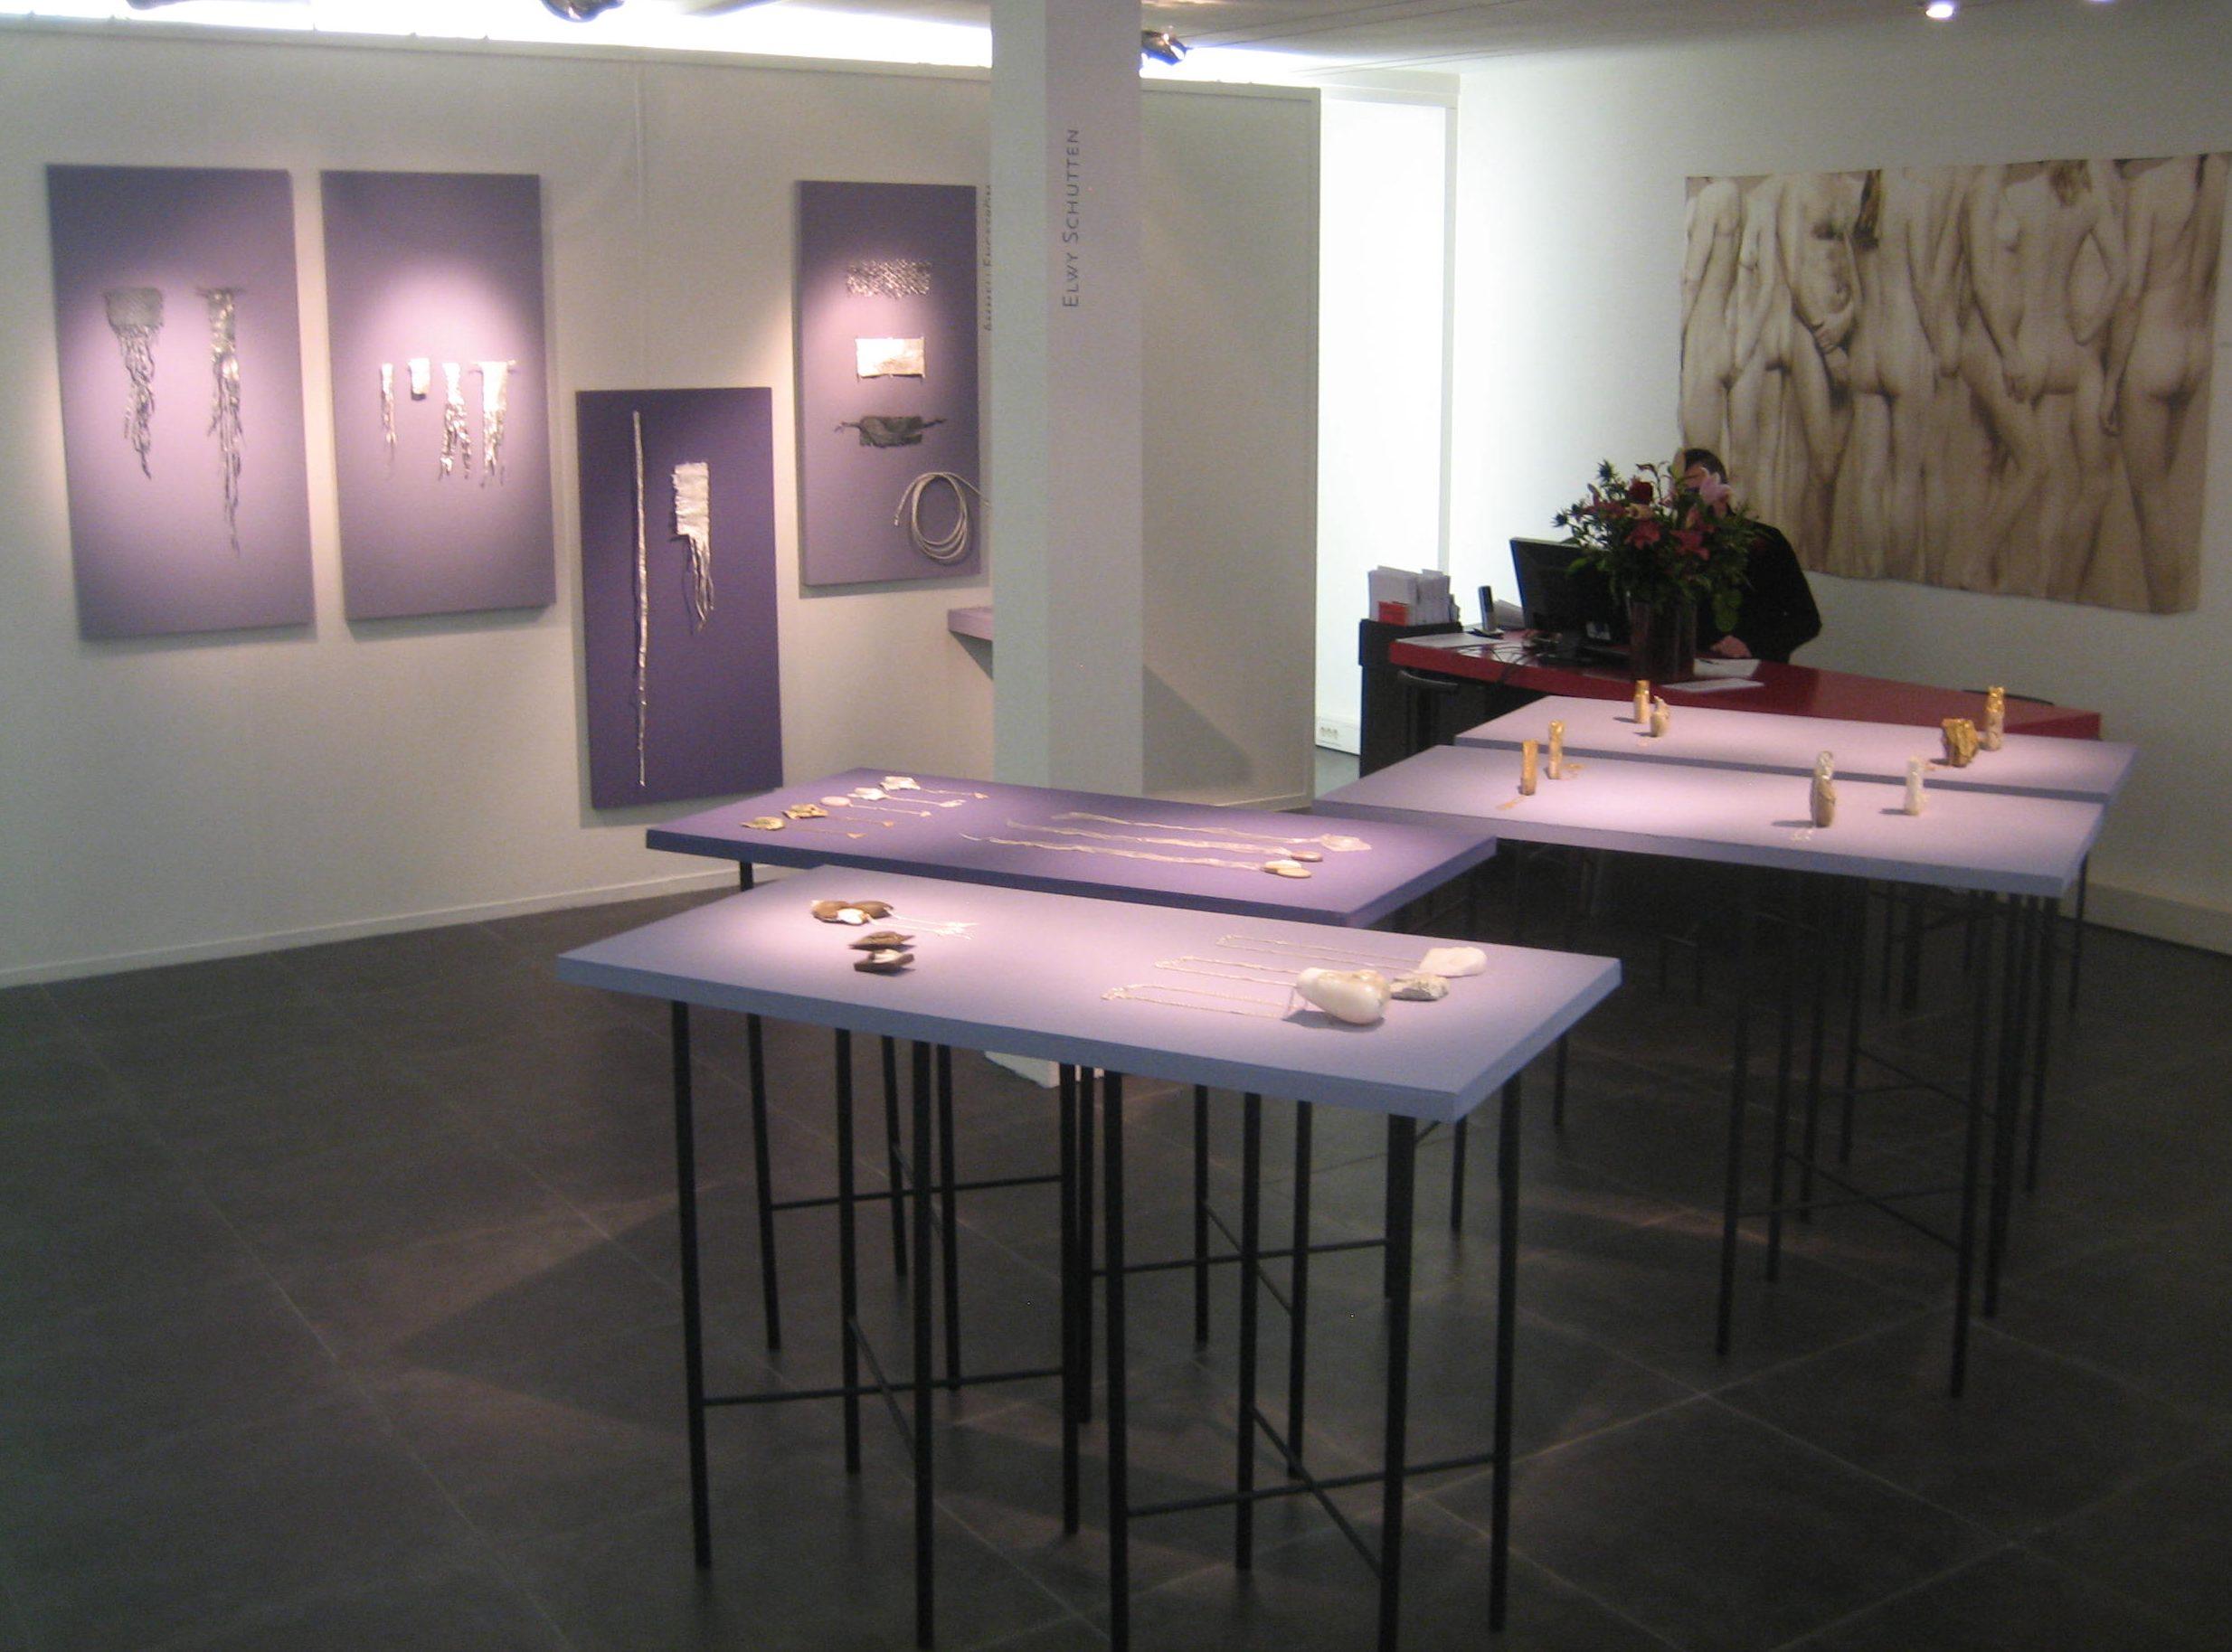 Elwy Schutten en Ammeli Engström in Galerie Ra, 2018. Foto Esther Doornbusch, CC BY 4.0